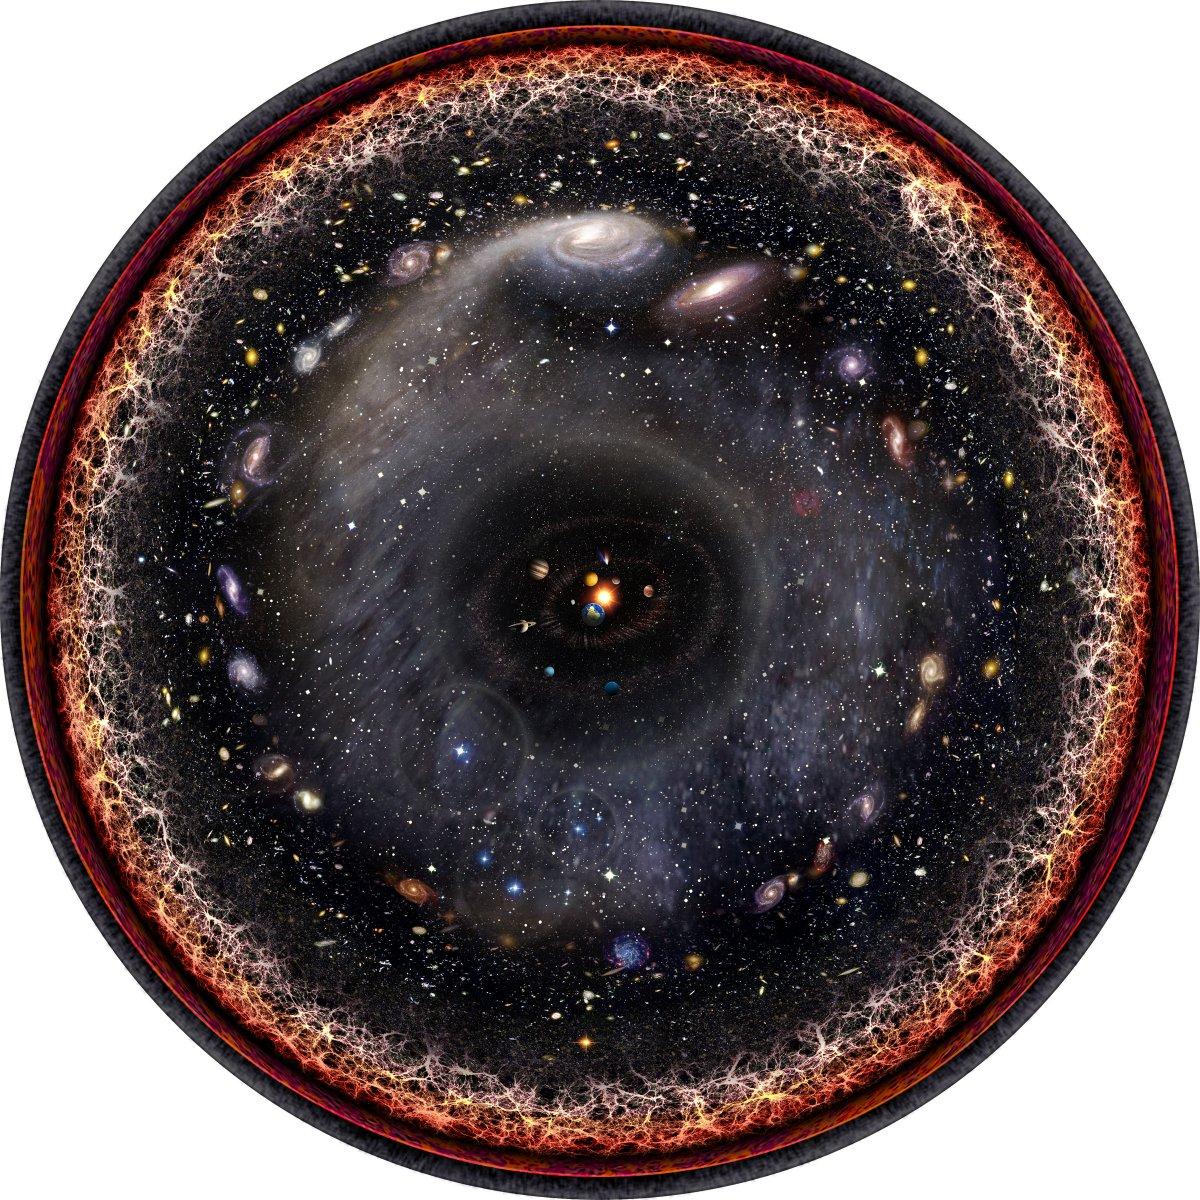 A Logarithmic Universe https://t.co/DqEroUkcae